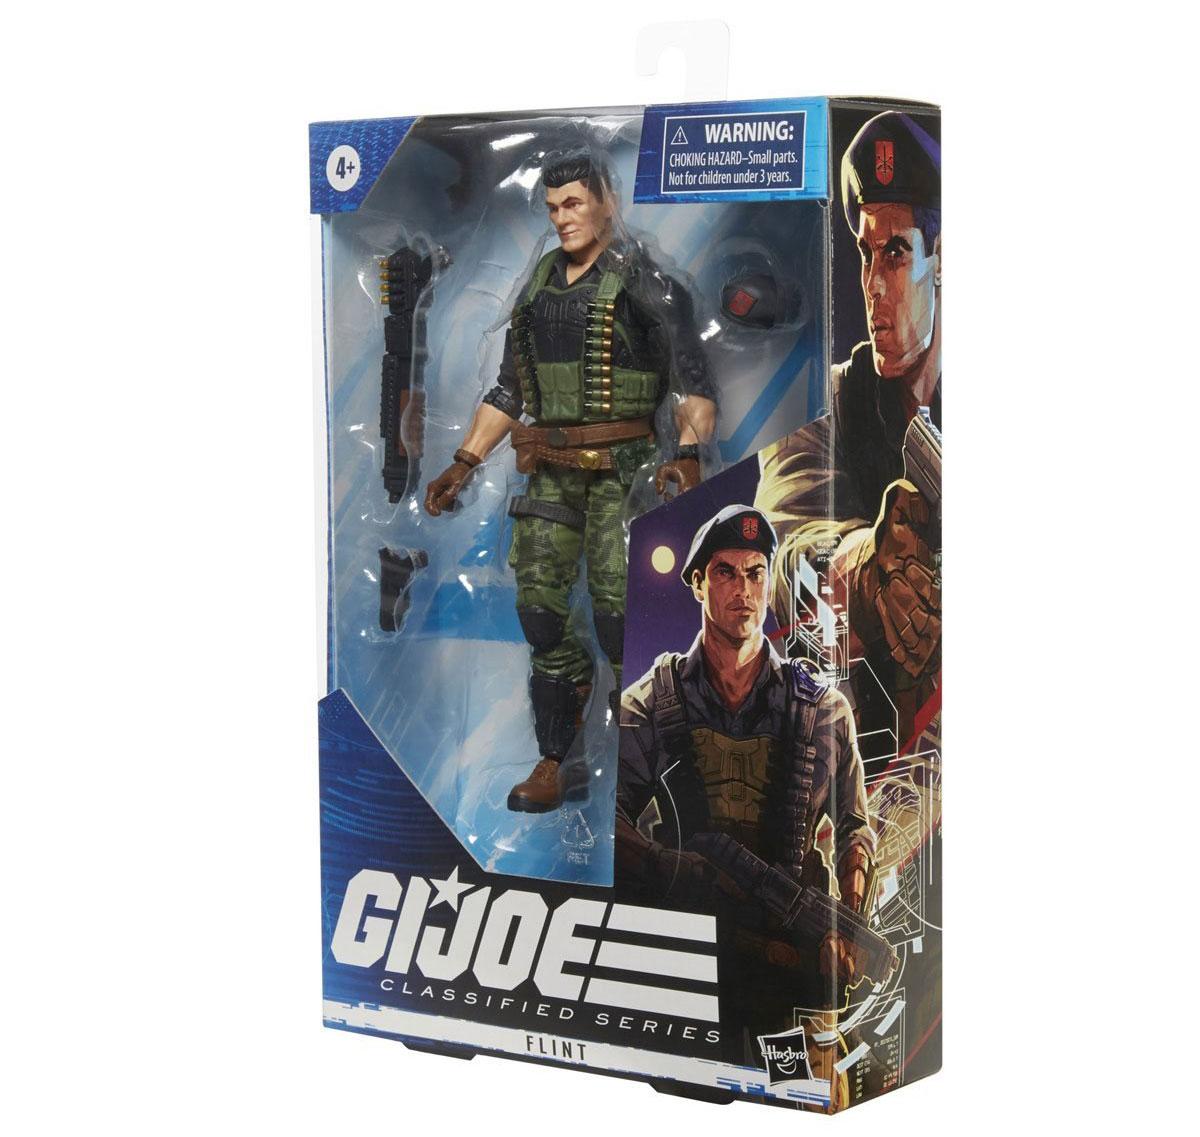 gi-joe-classified-series-flint-action-figure-box-art-packaging